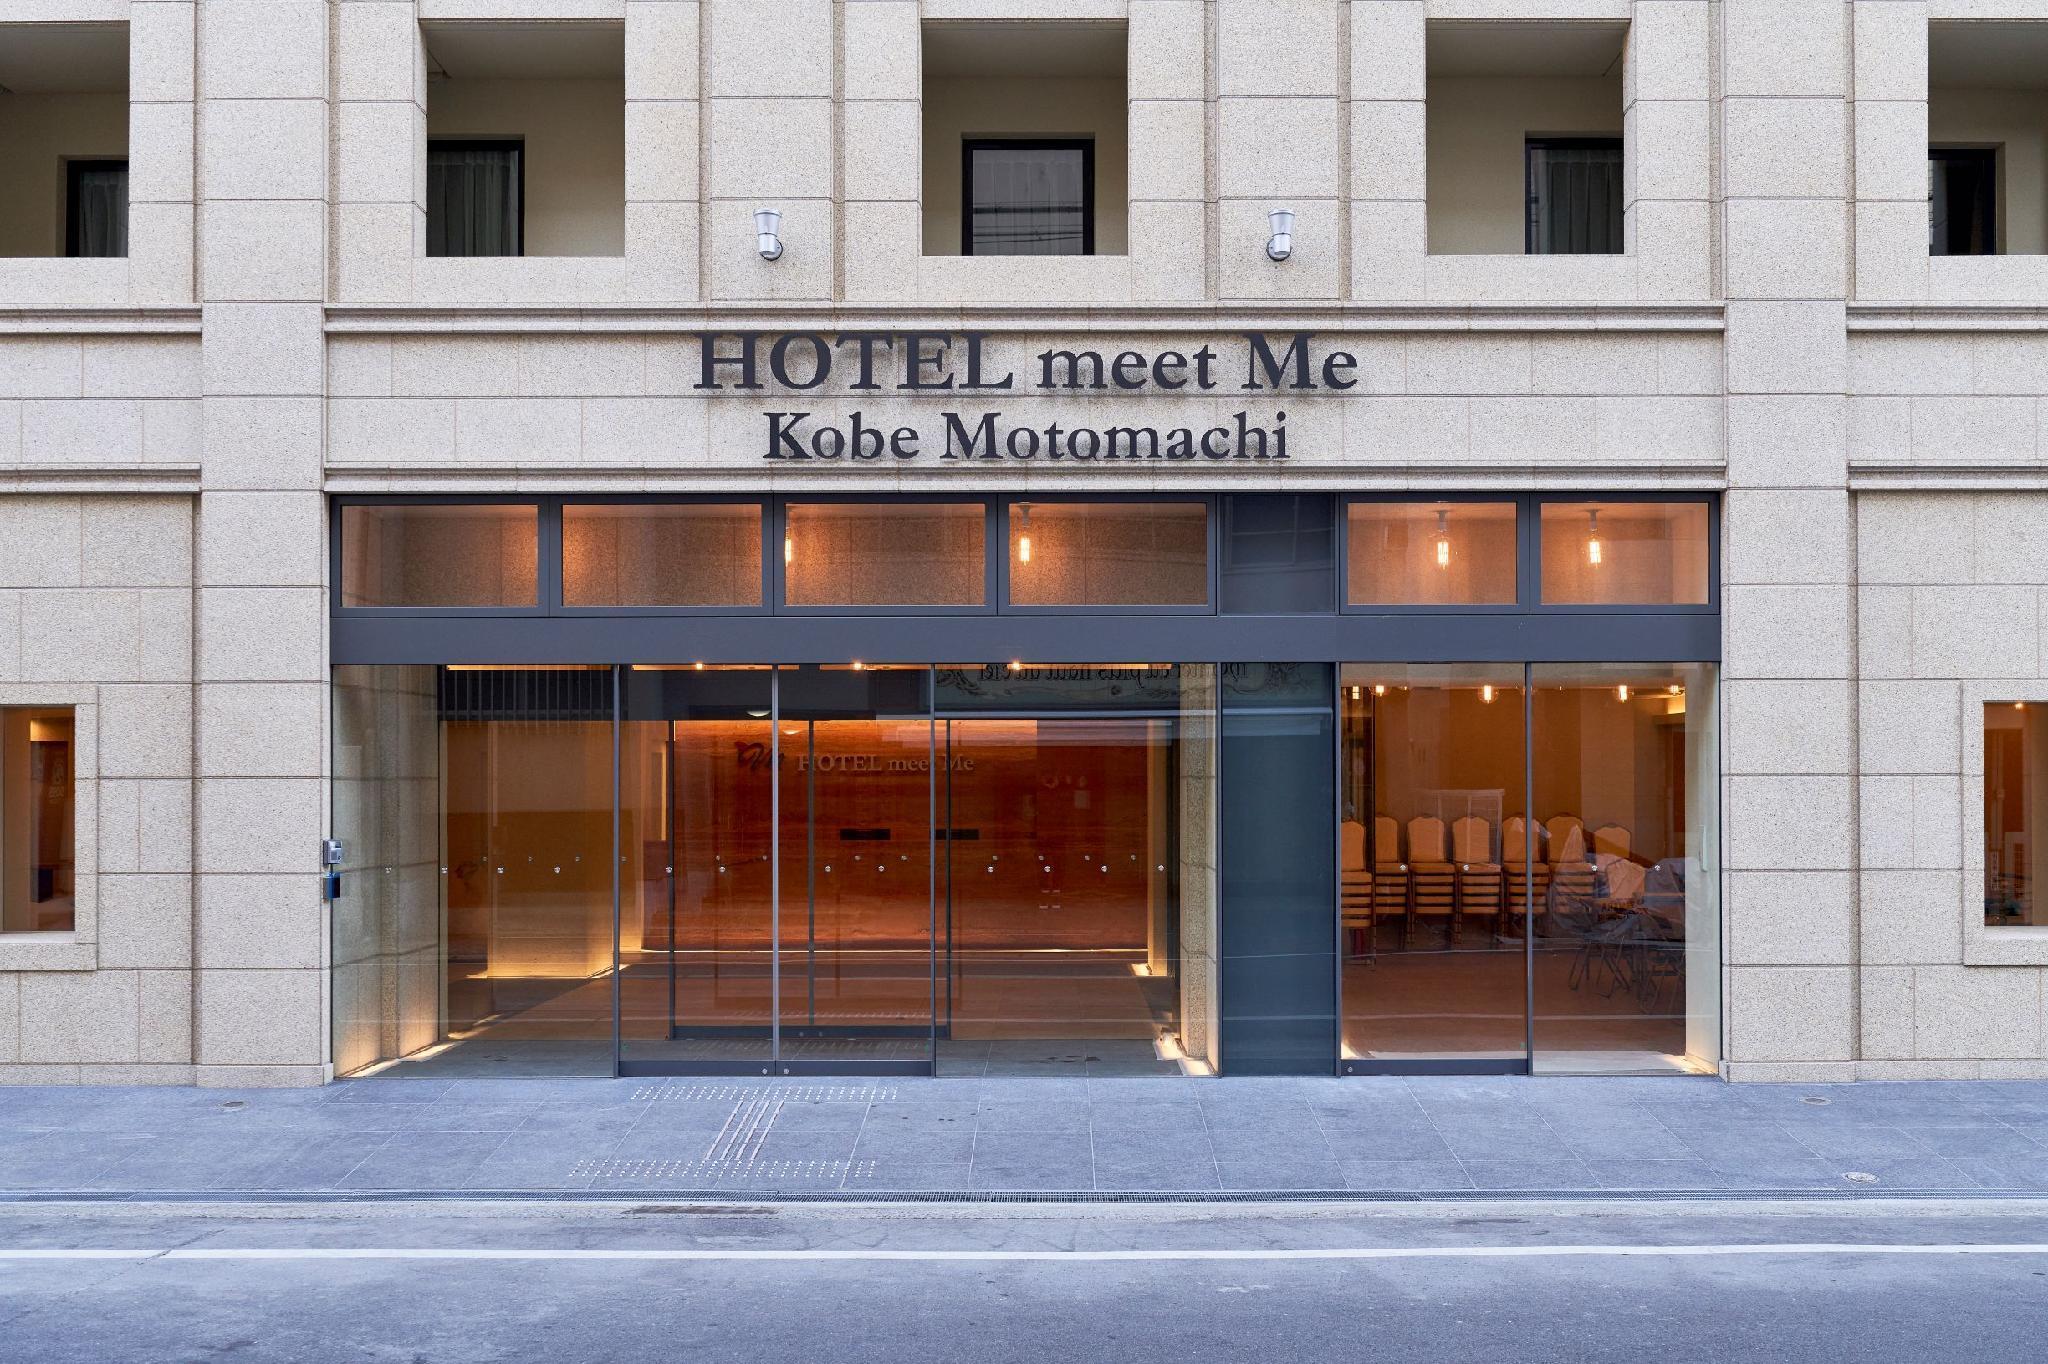 Hotel Meet Me Kobe Motomachi